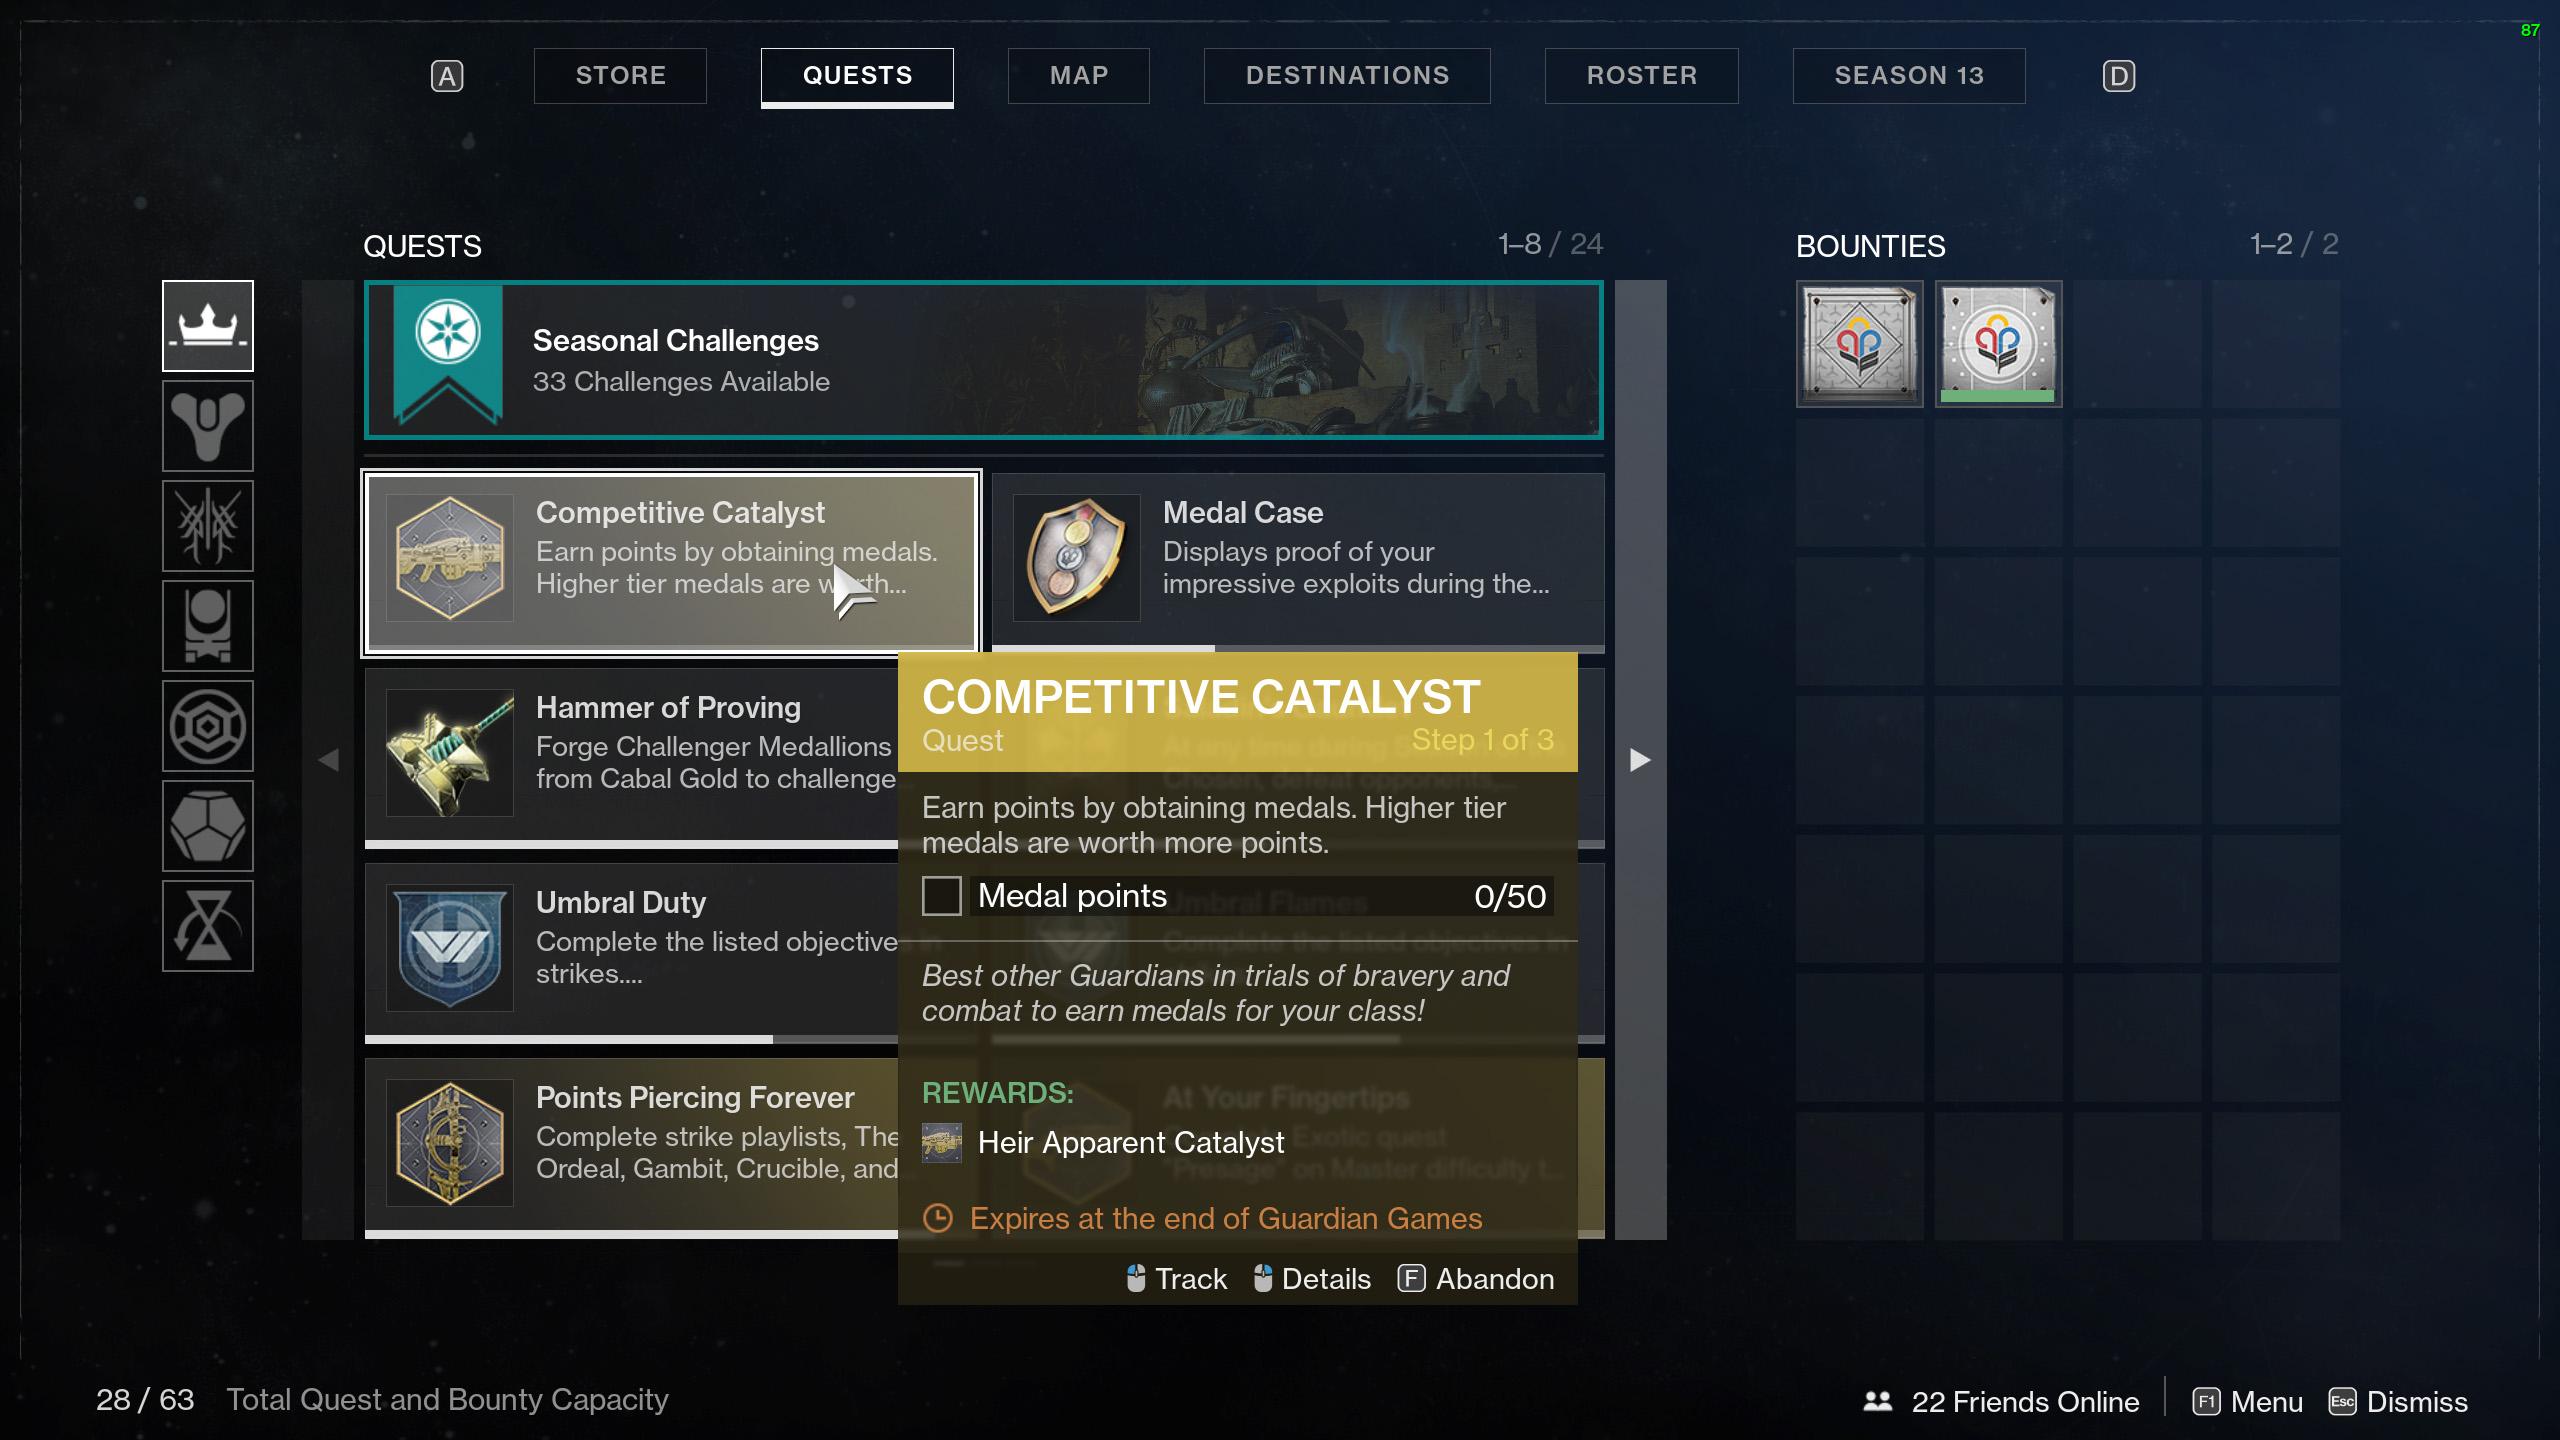 destiny 2 competitive catalyst